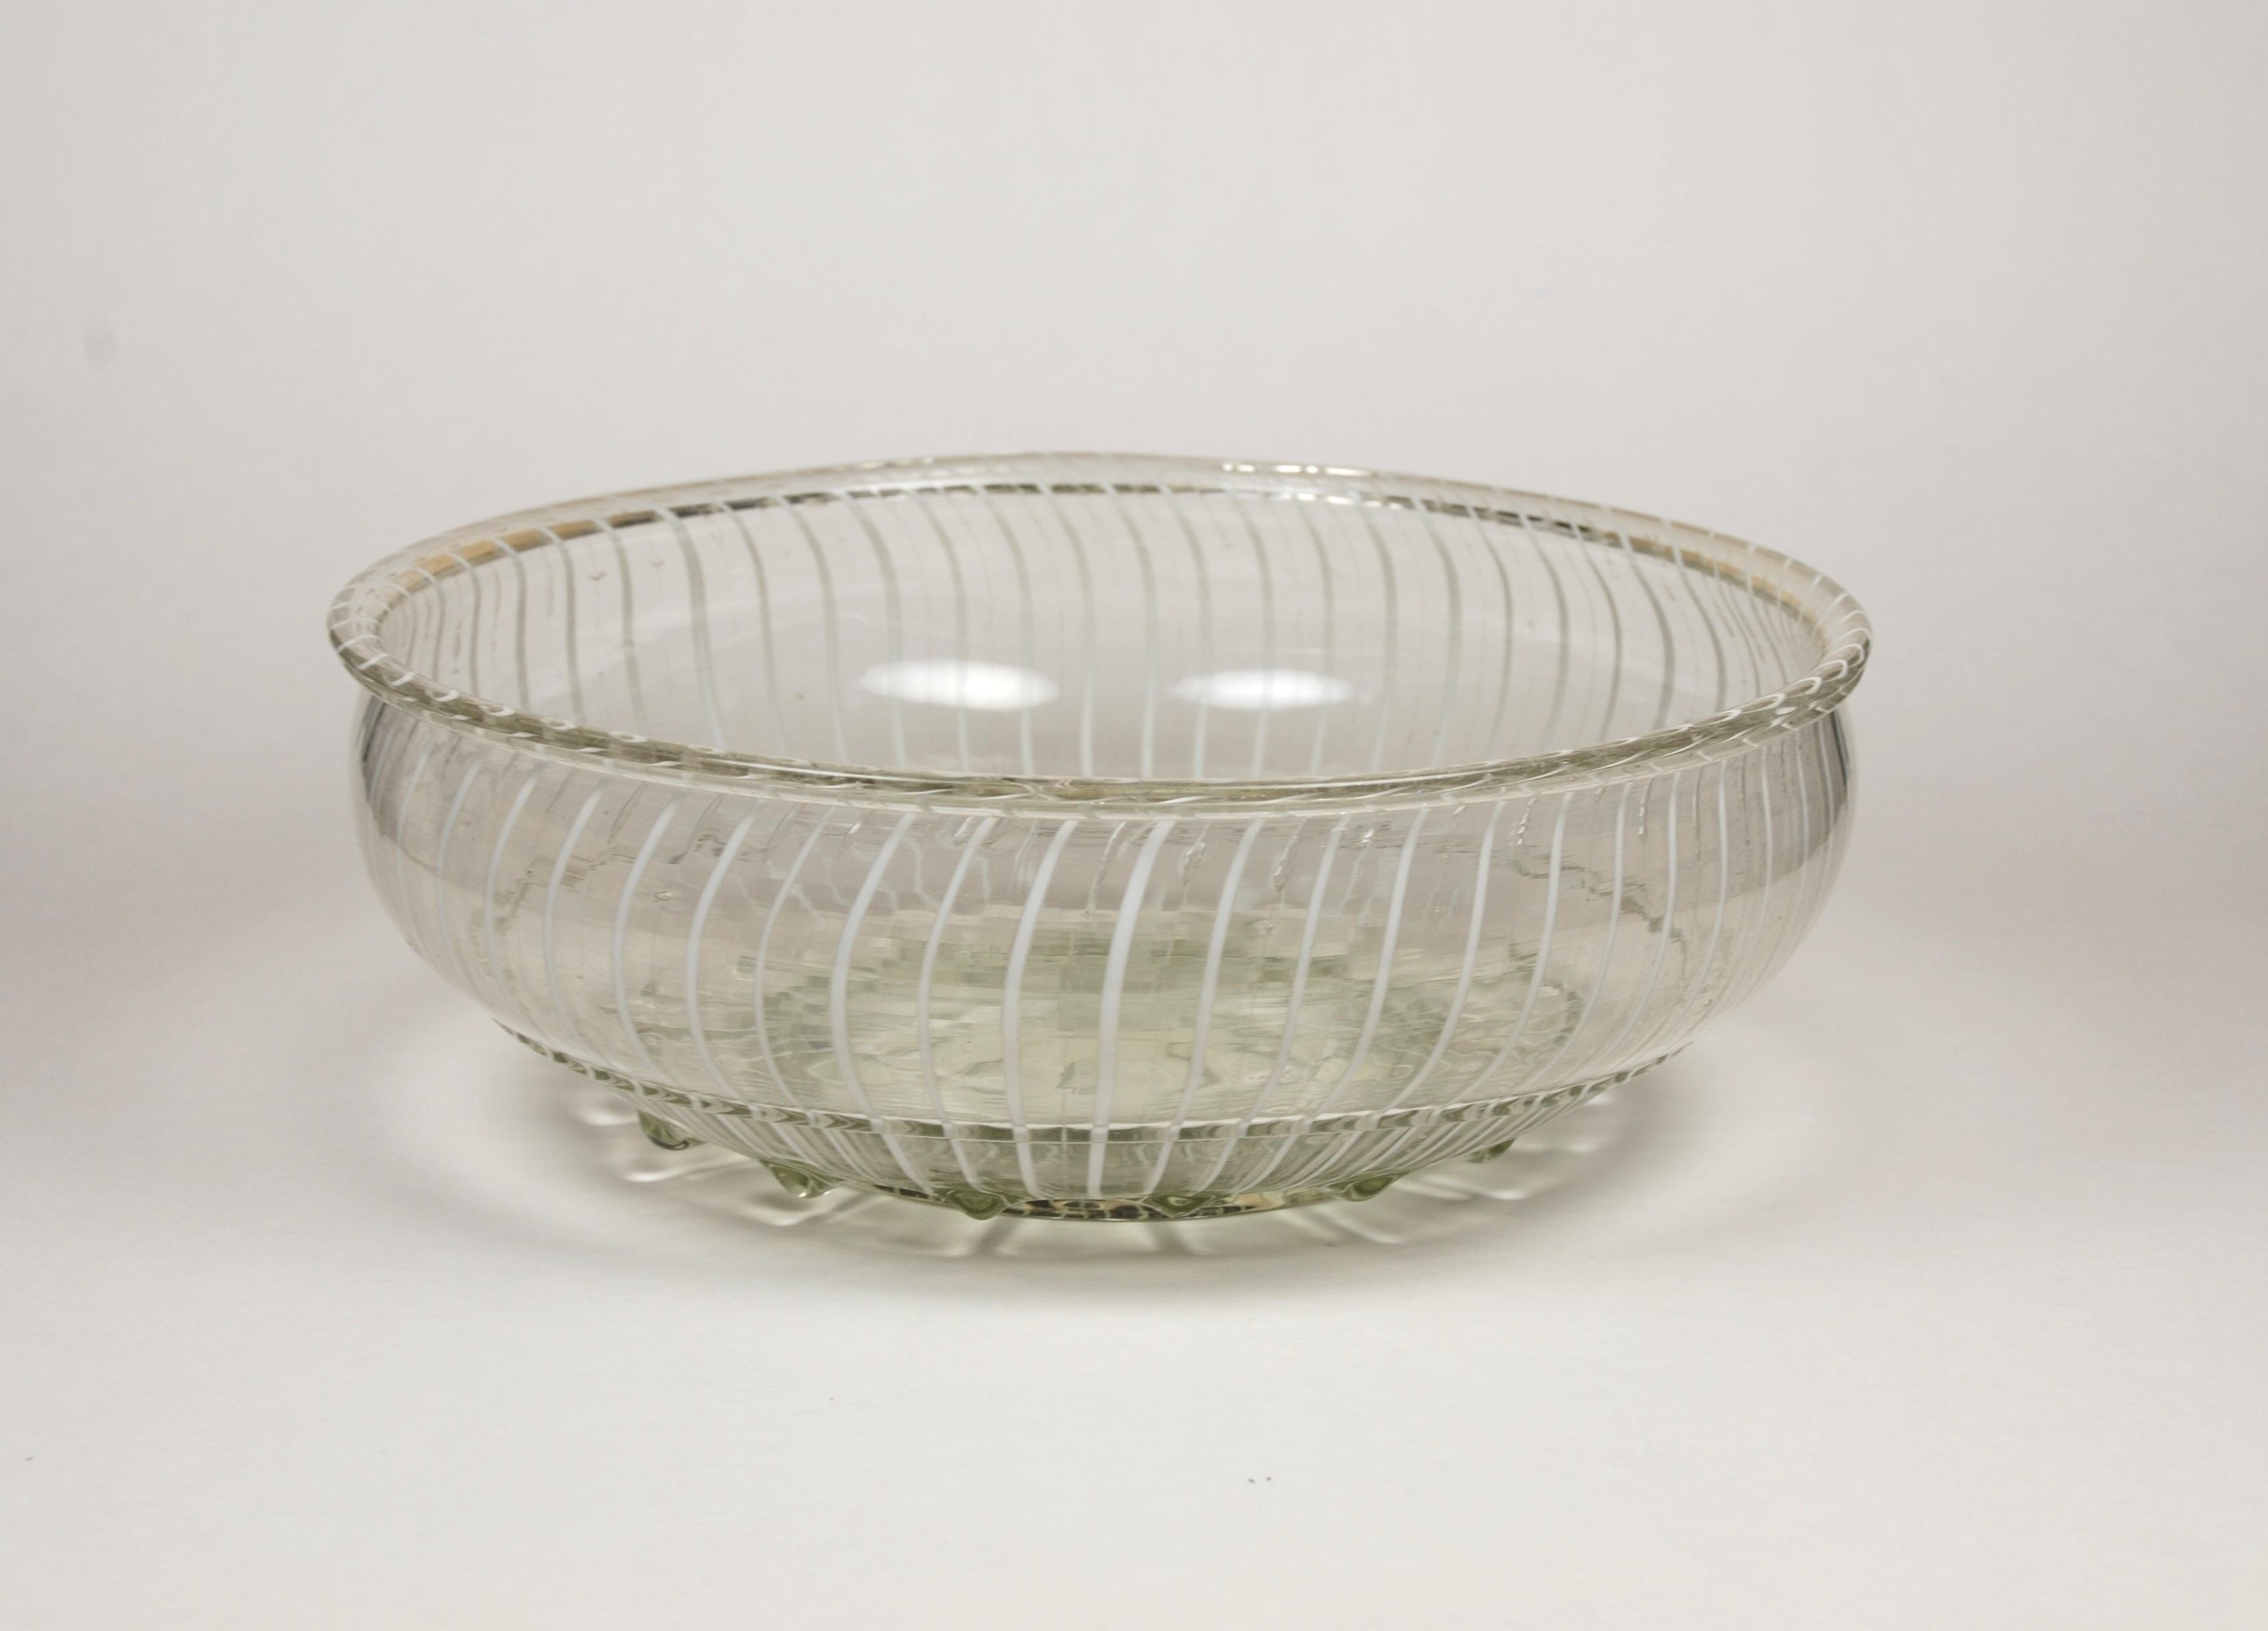 venetian facon de venise glass ancient glass blog of the allaire collection. Black Bedroom Furniture Sets. Home Design Ideas